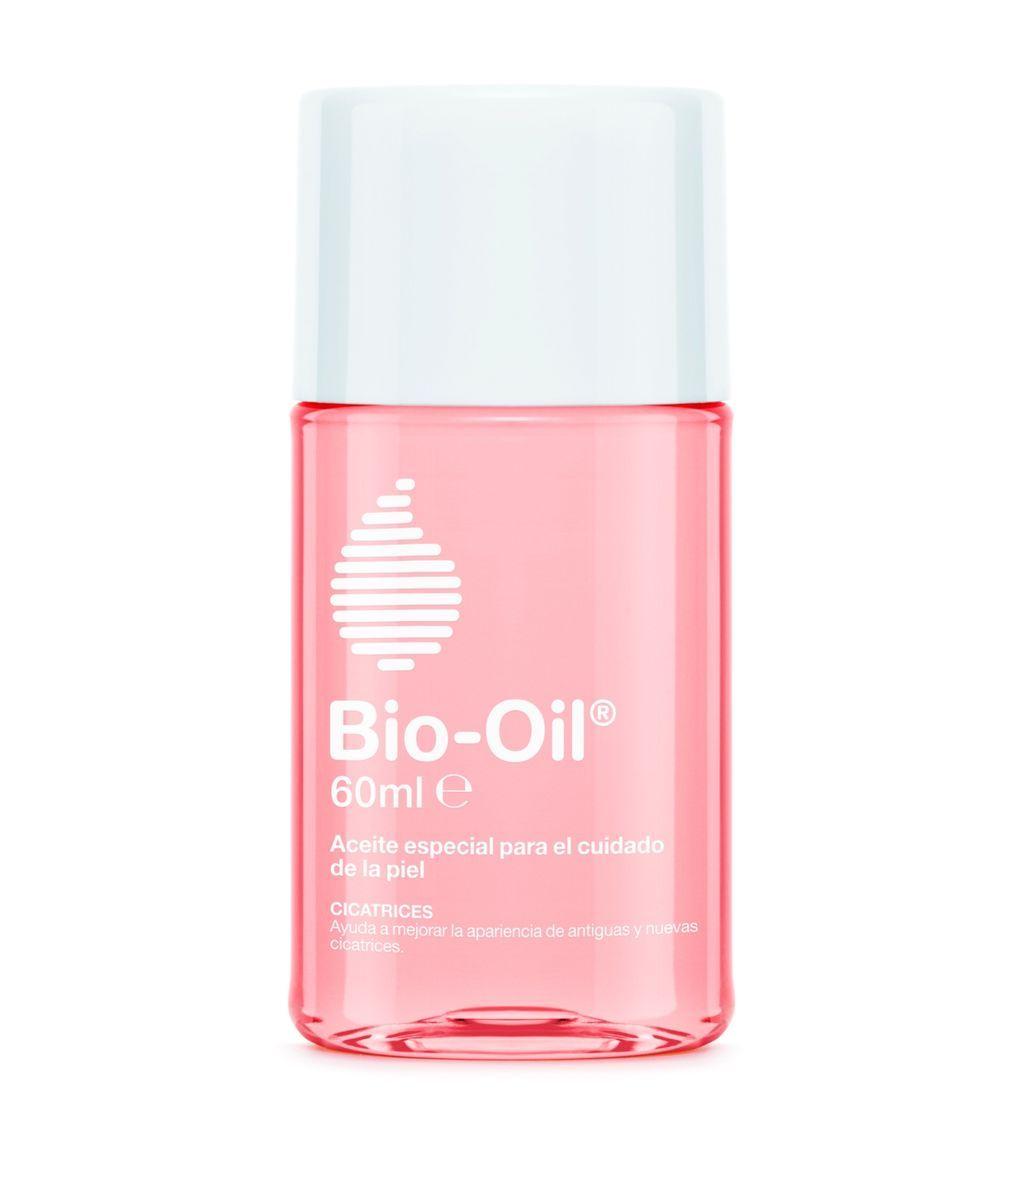 BIO-OIL 60ML (1)